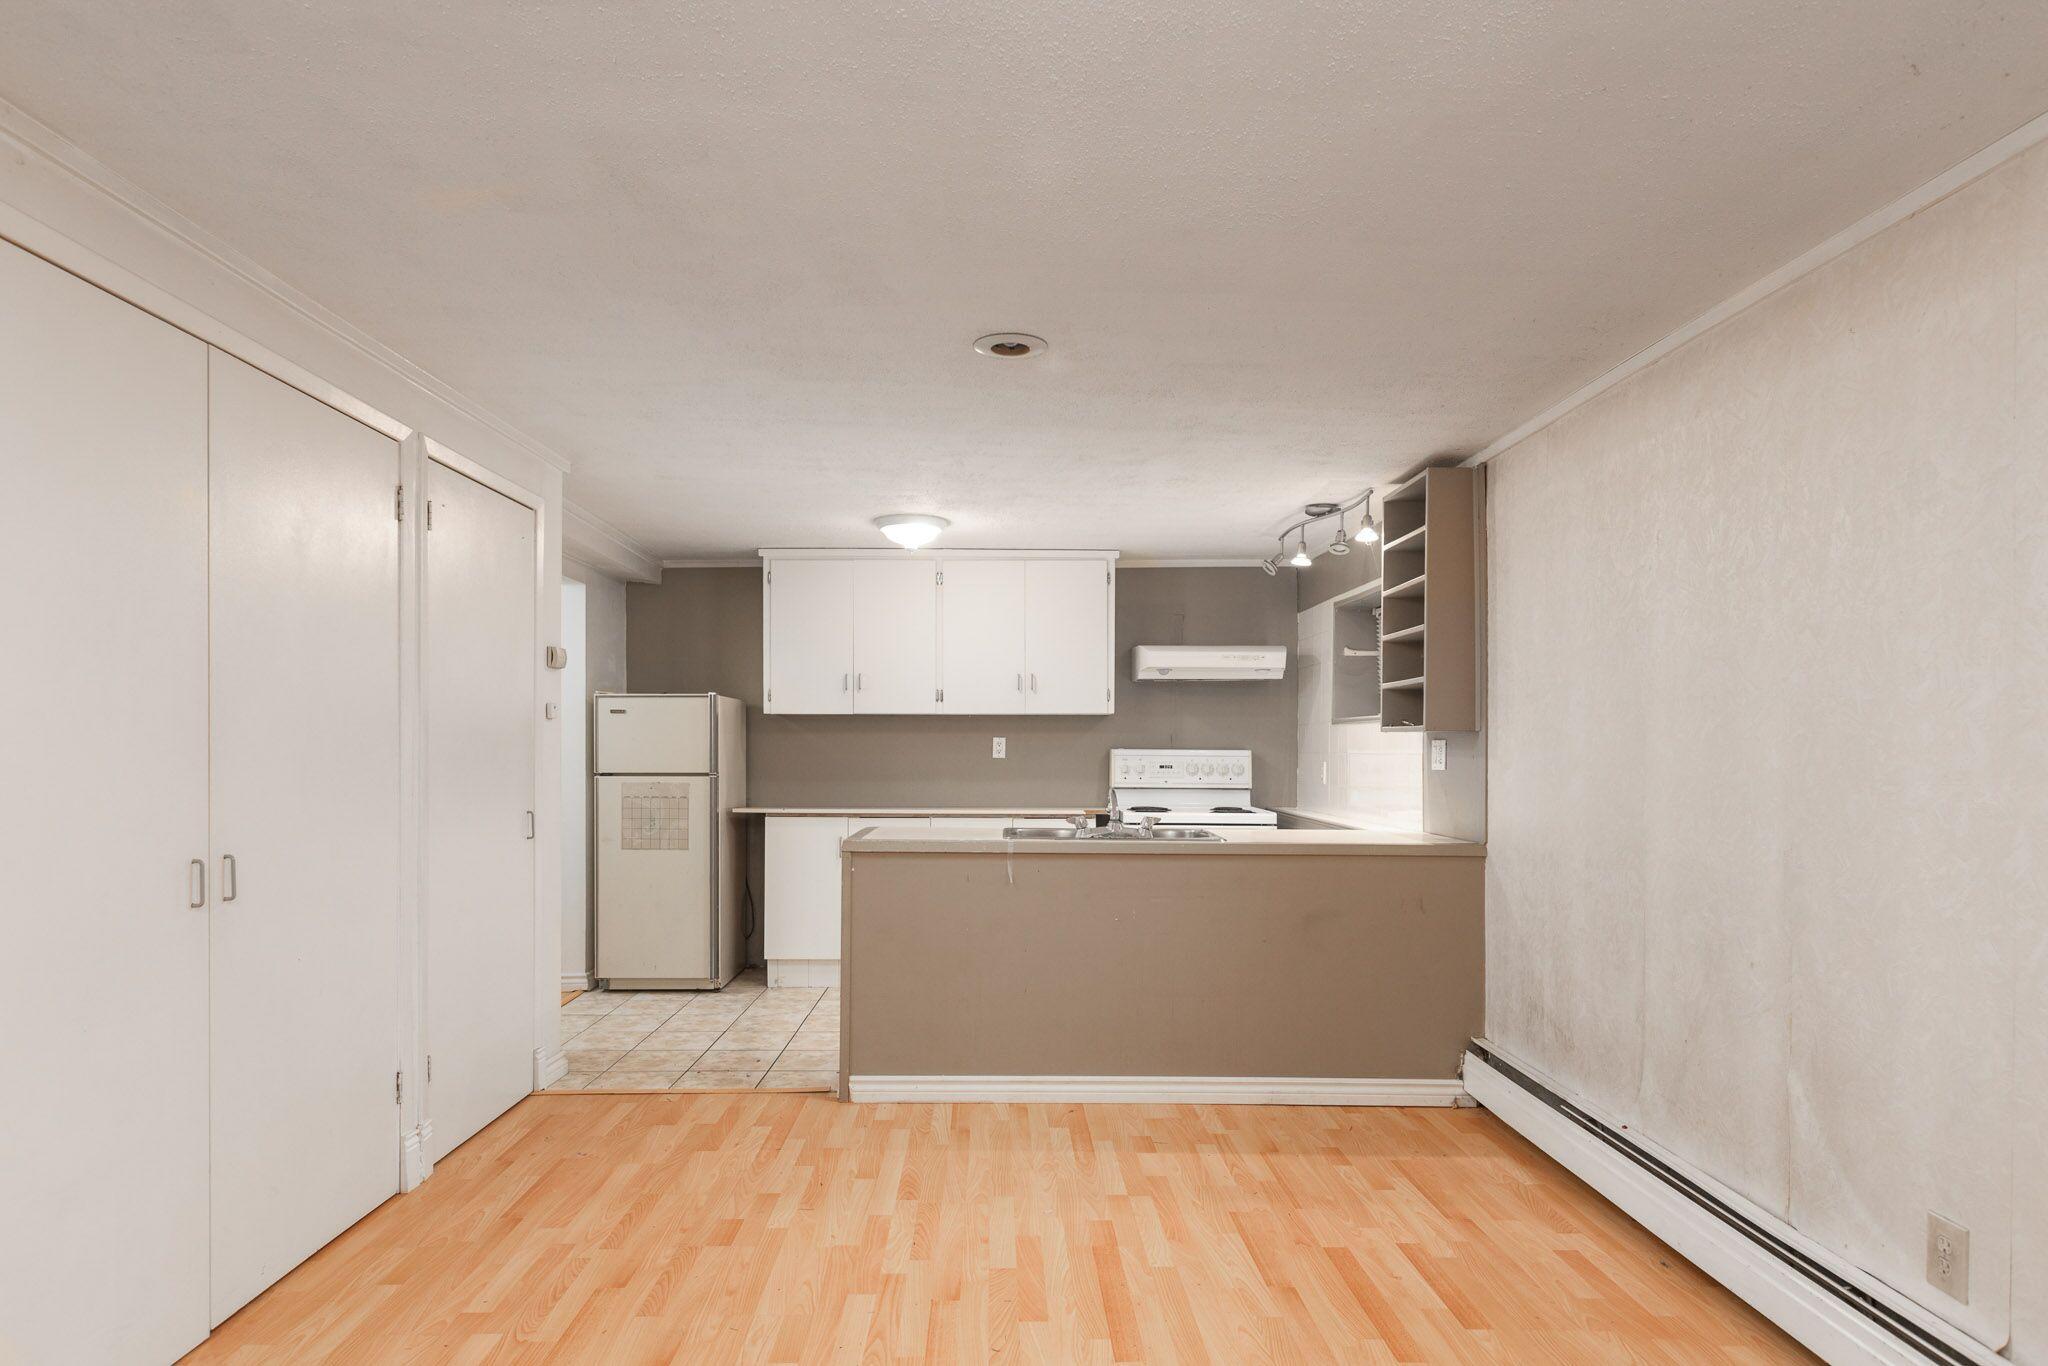 Clean & Cozy Lower Suite On Clark Park w/ Utilities!